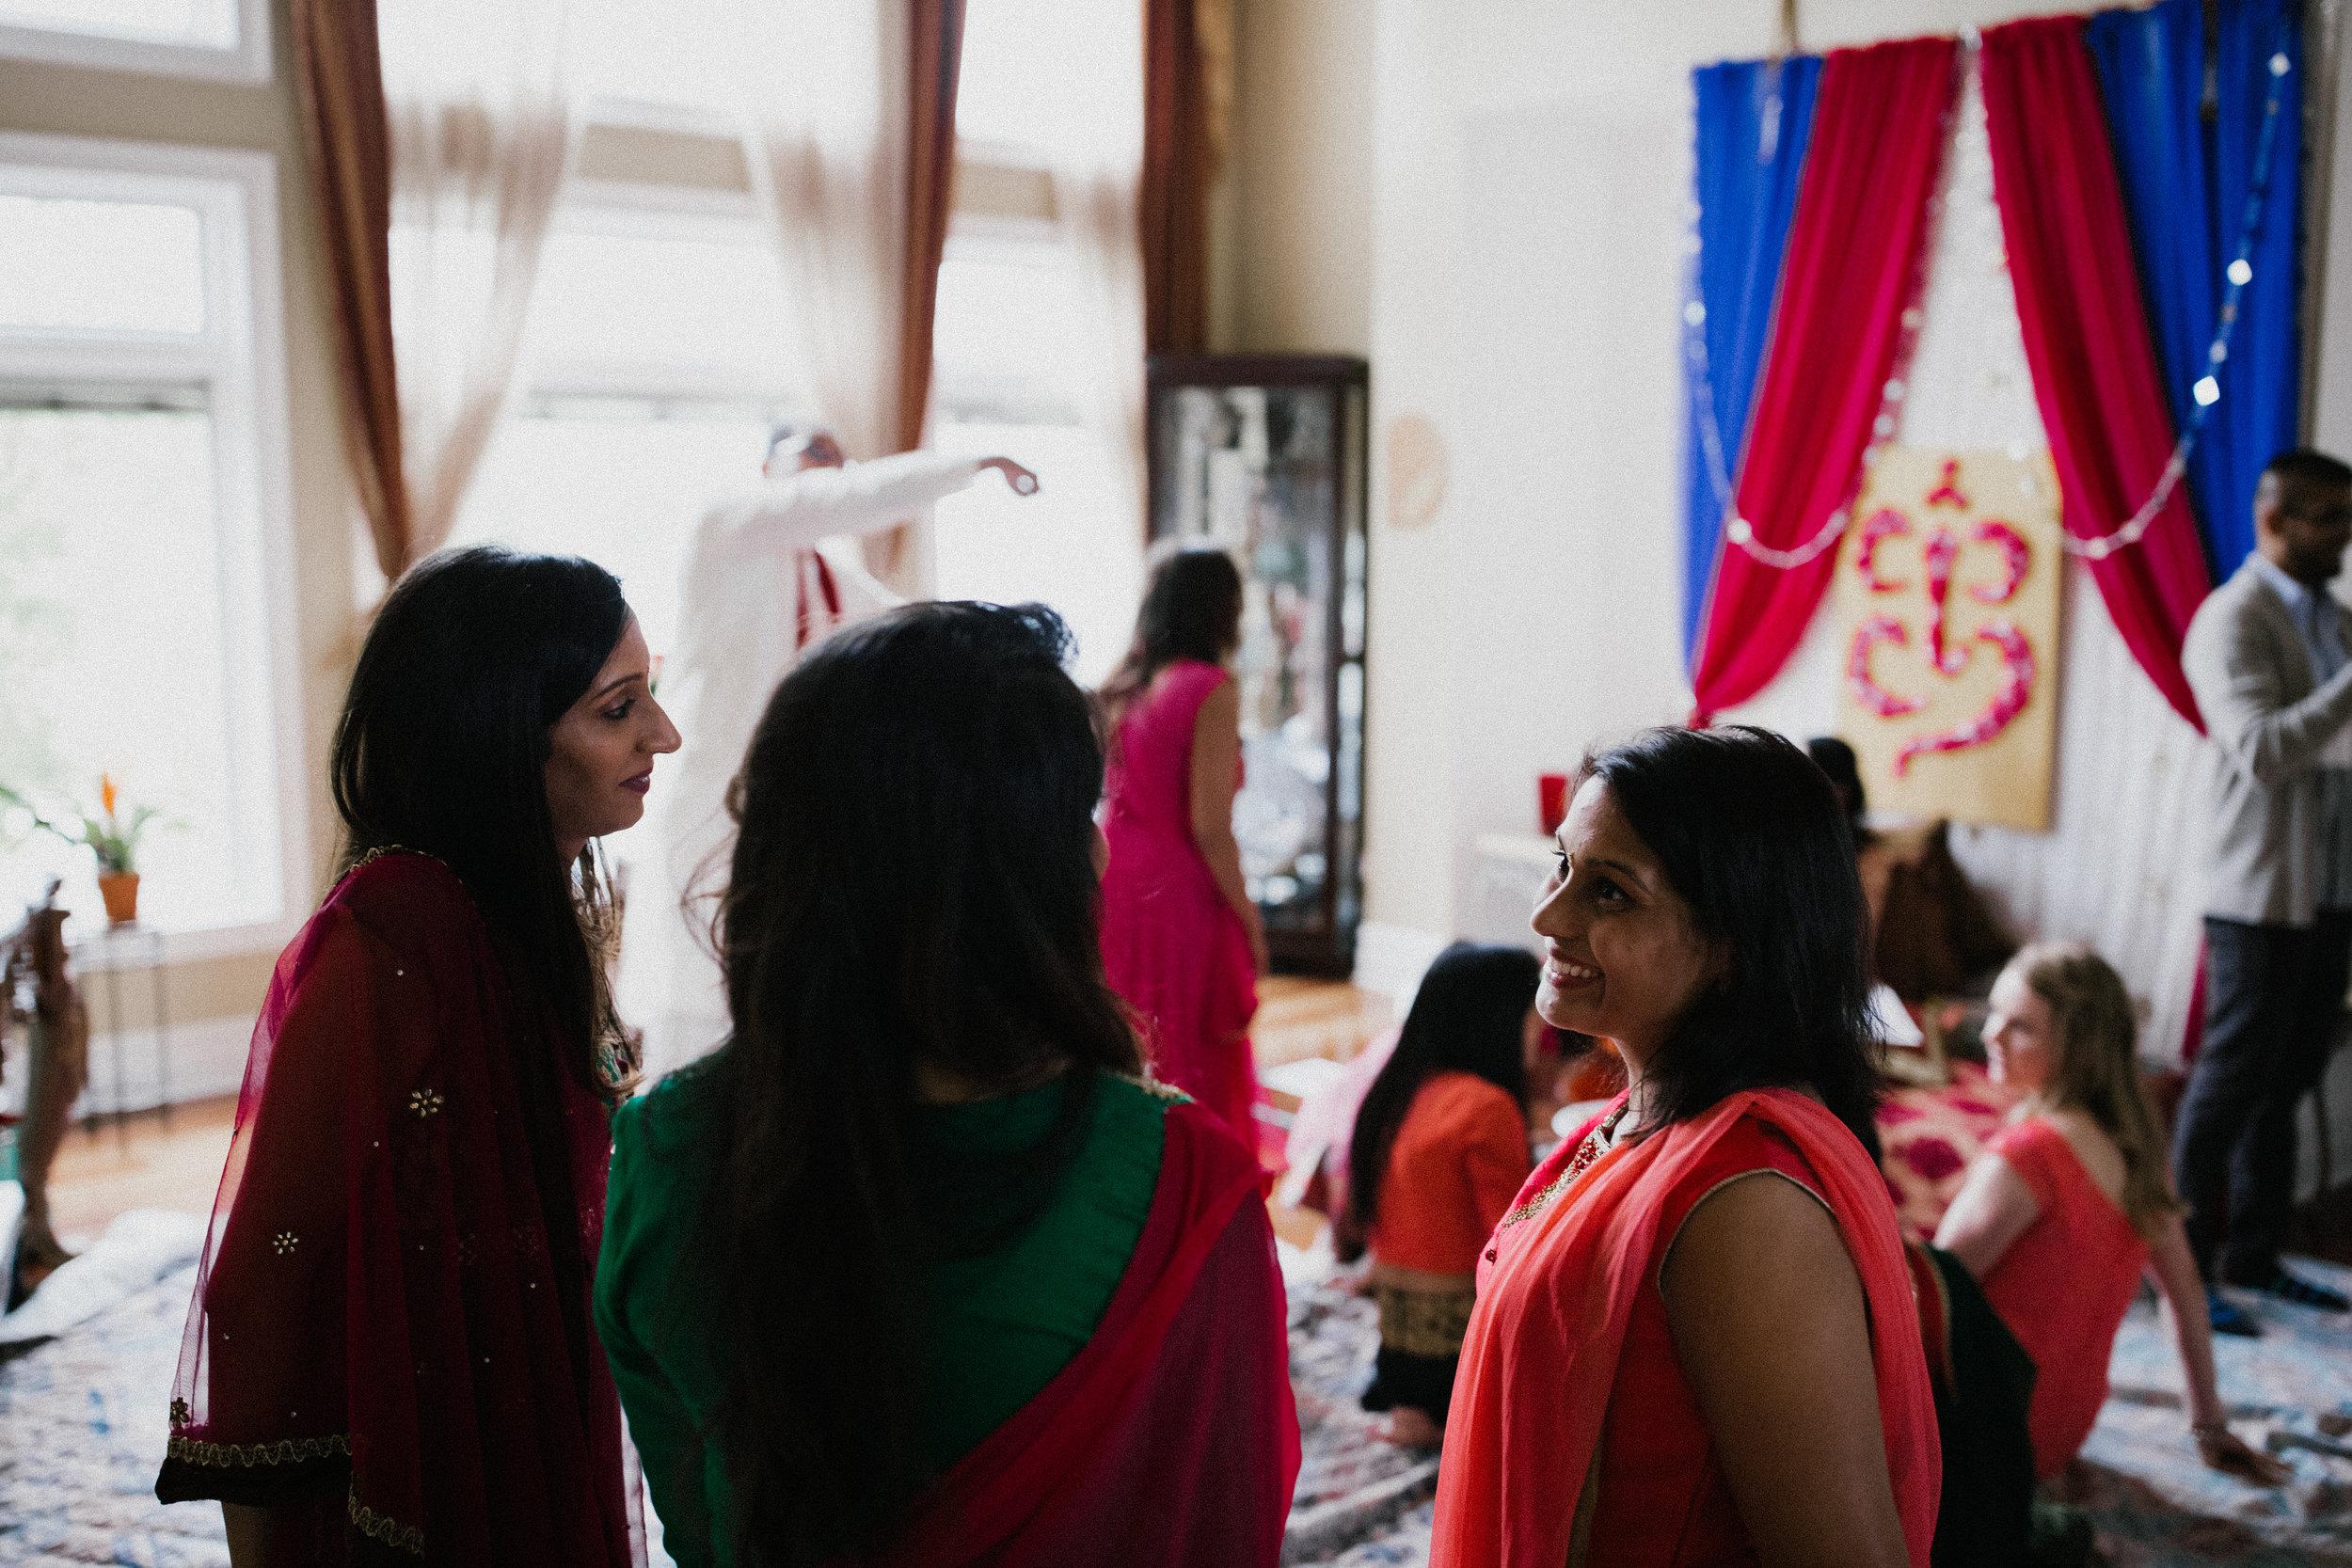 Aparna-Ankit-Patel-Mehndi-Wedding-Photos-0016.jpg